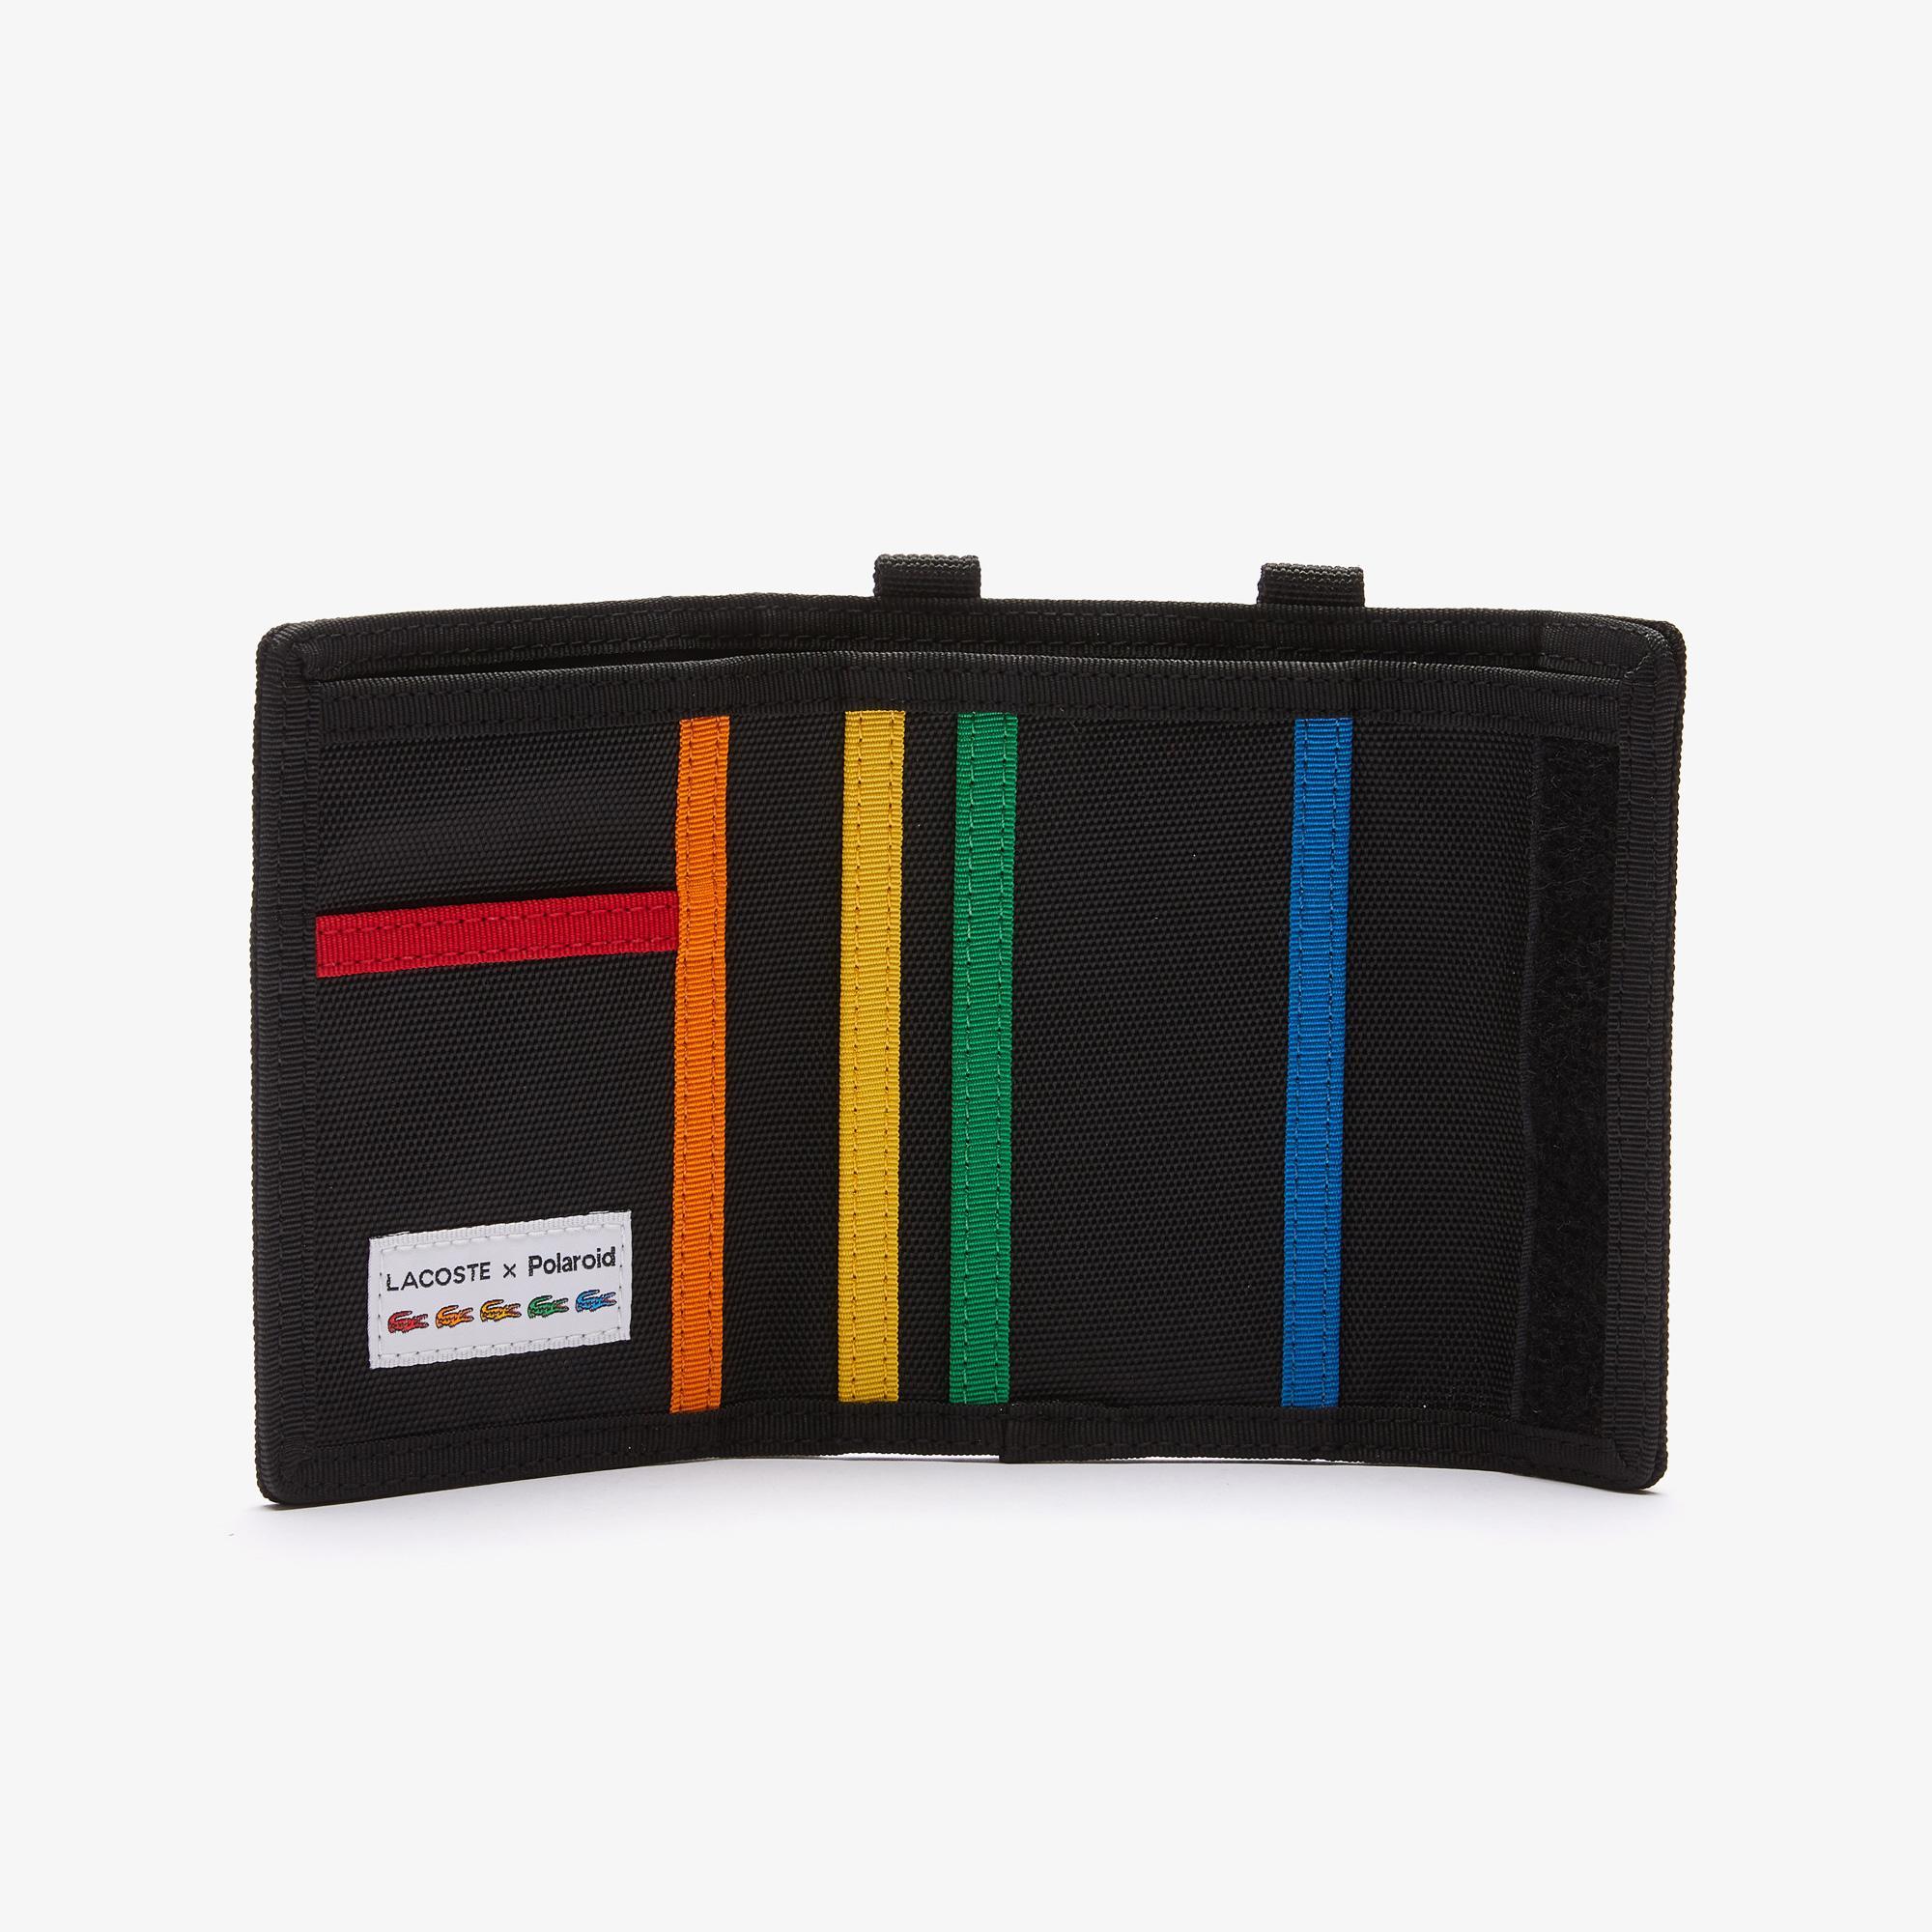 Lacoste X Polaroid Unisex Siyah Cüzdan